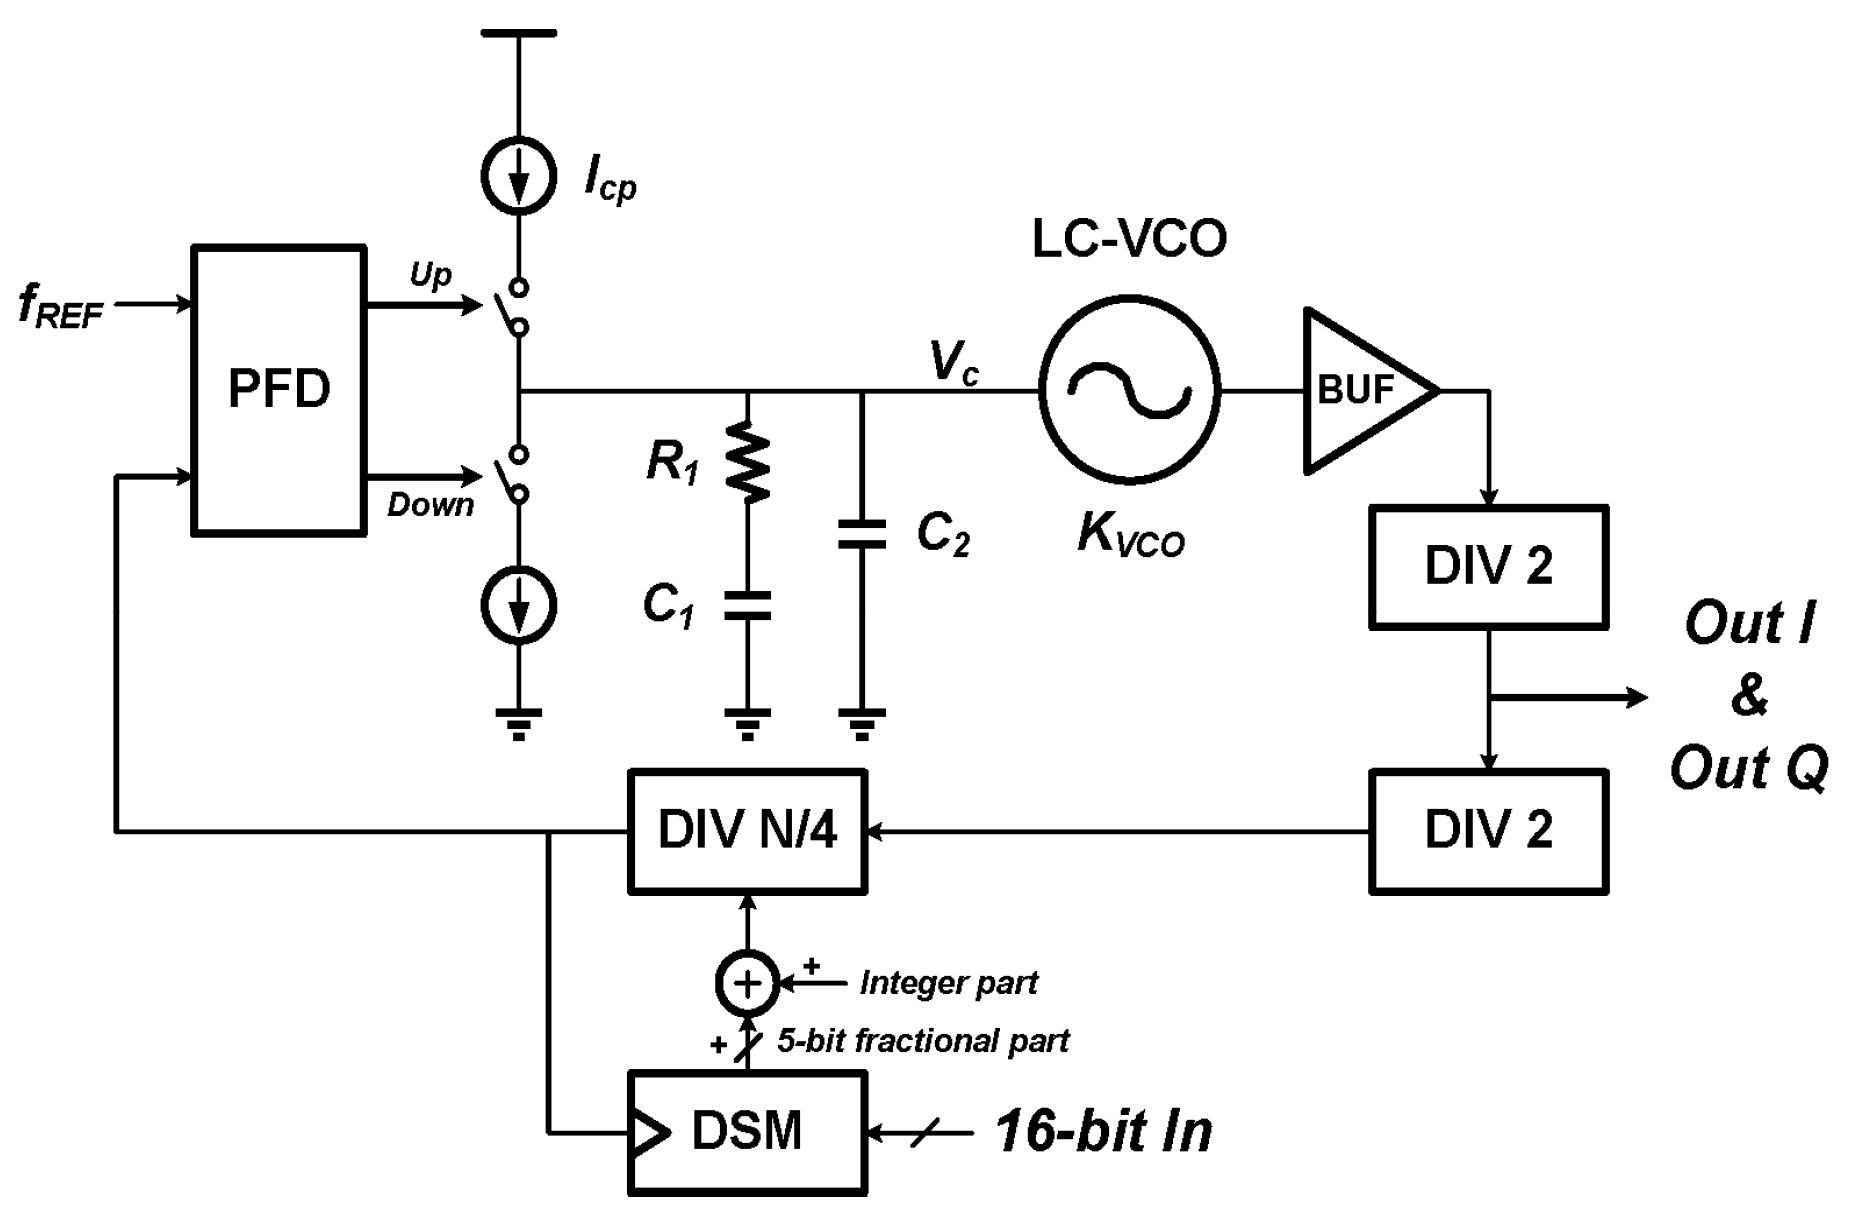 rv hot water heater wiring diagram 2002 pontiac bonneville stereo suburban sw6de dsi